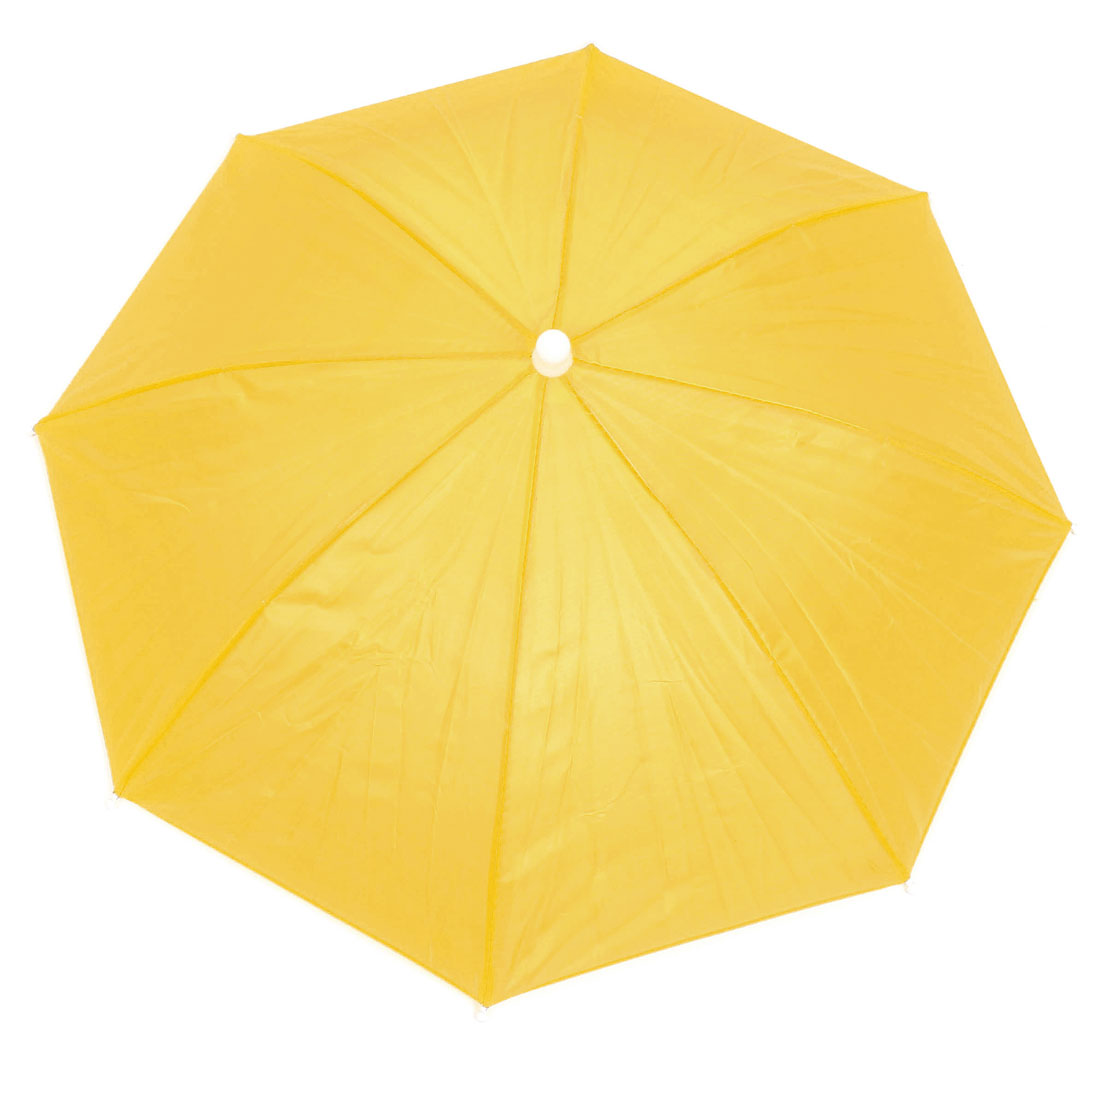 Outdoor Fishing Headwear Polyester Canopy Umbrella Hat Cap Yellow